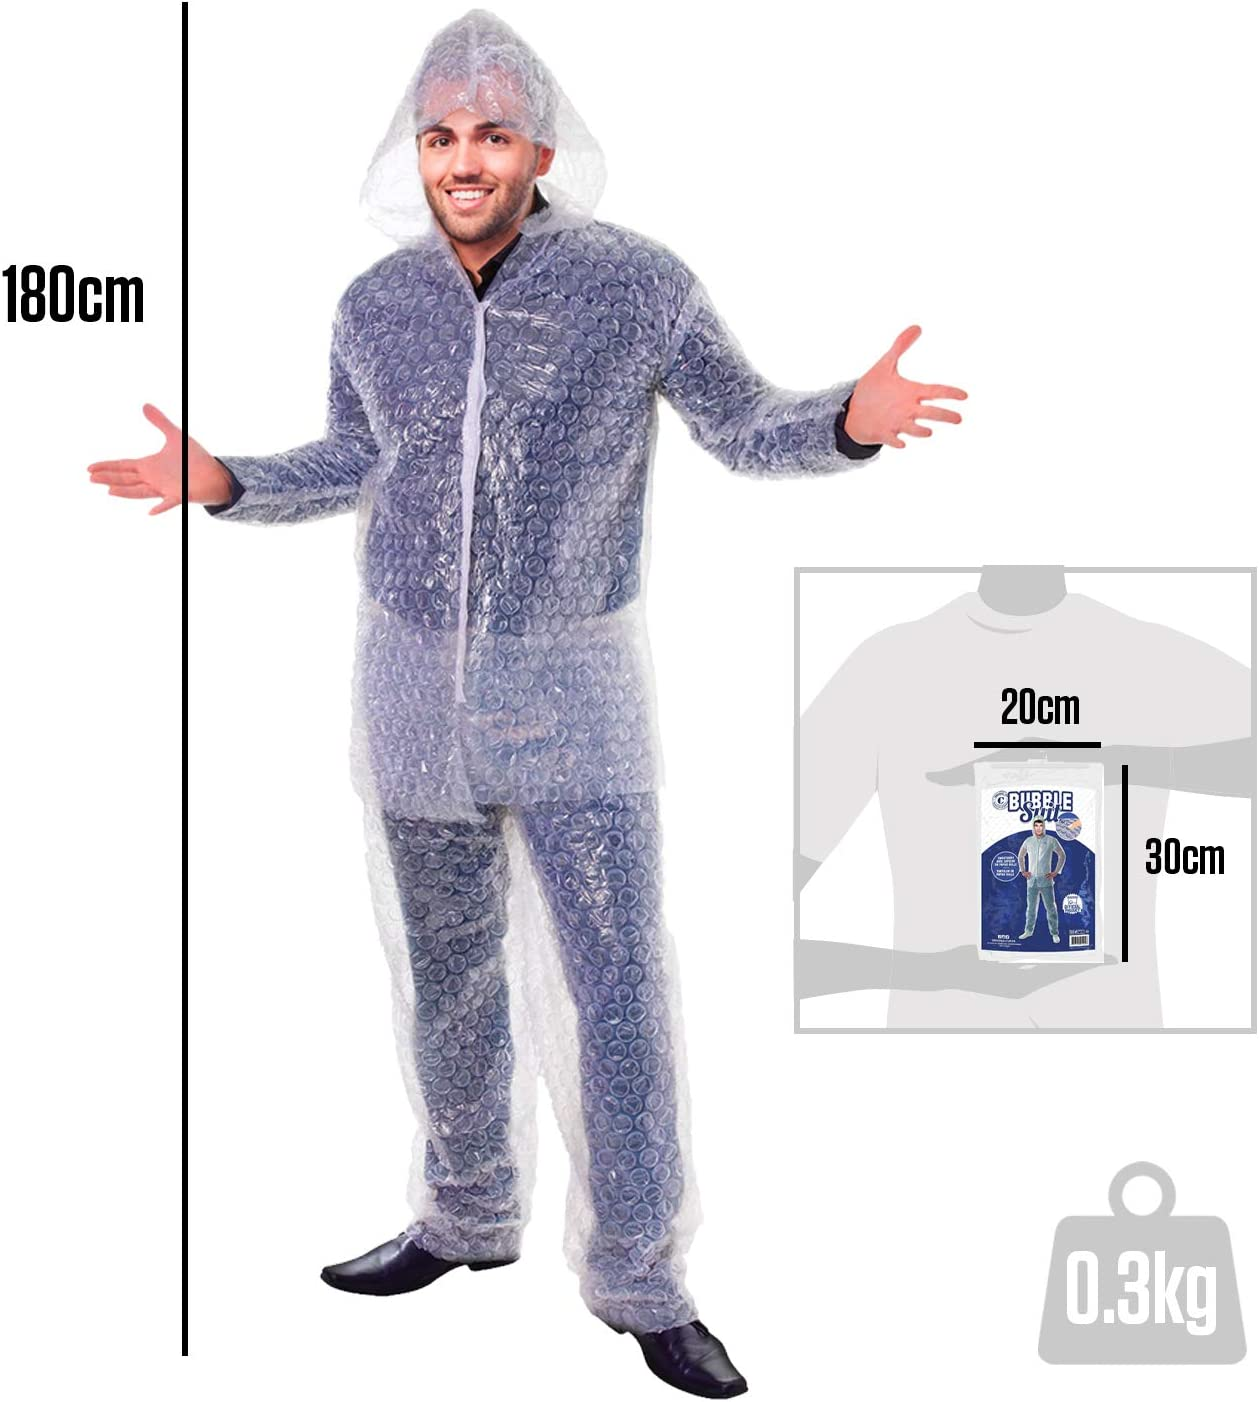 /Bubble Suit Disfraz de papel burbuja para vous /éclater vestido de cumplea/ños talla /única unisex adulto Original Cup/